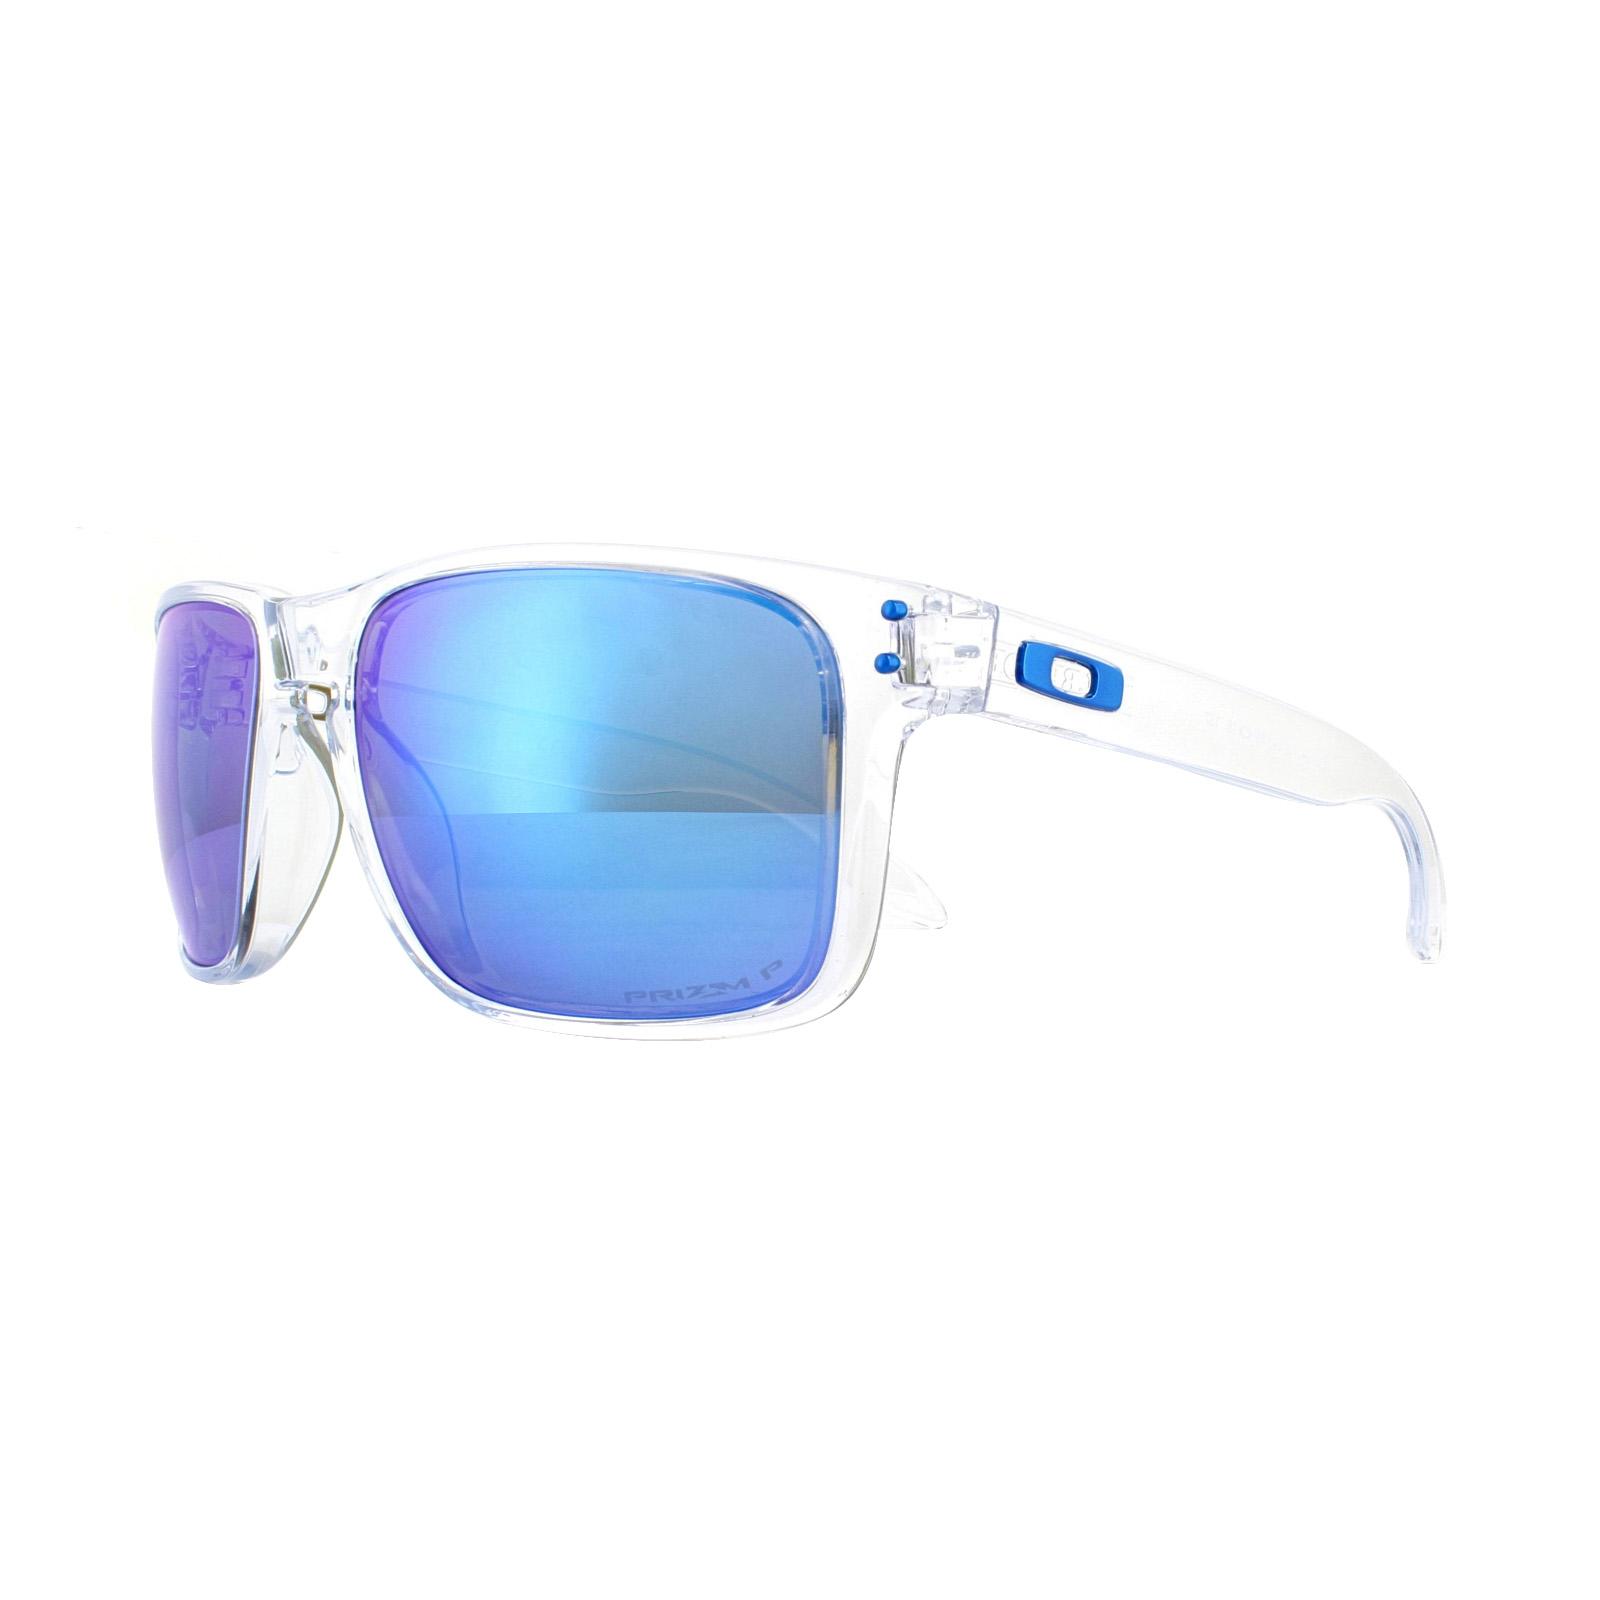 aef77a7da868 Sentinel Oakley Sunglasses Holbrook XL OO9417-07 Polished Clear Prizm  Sapphire Polarized